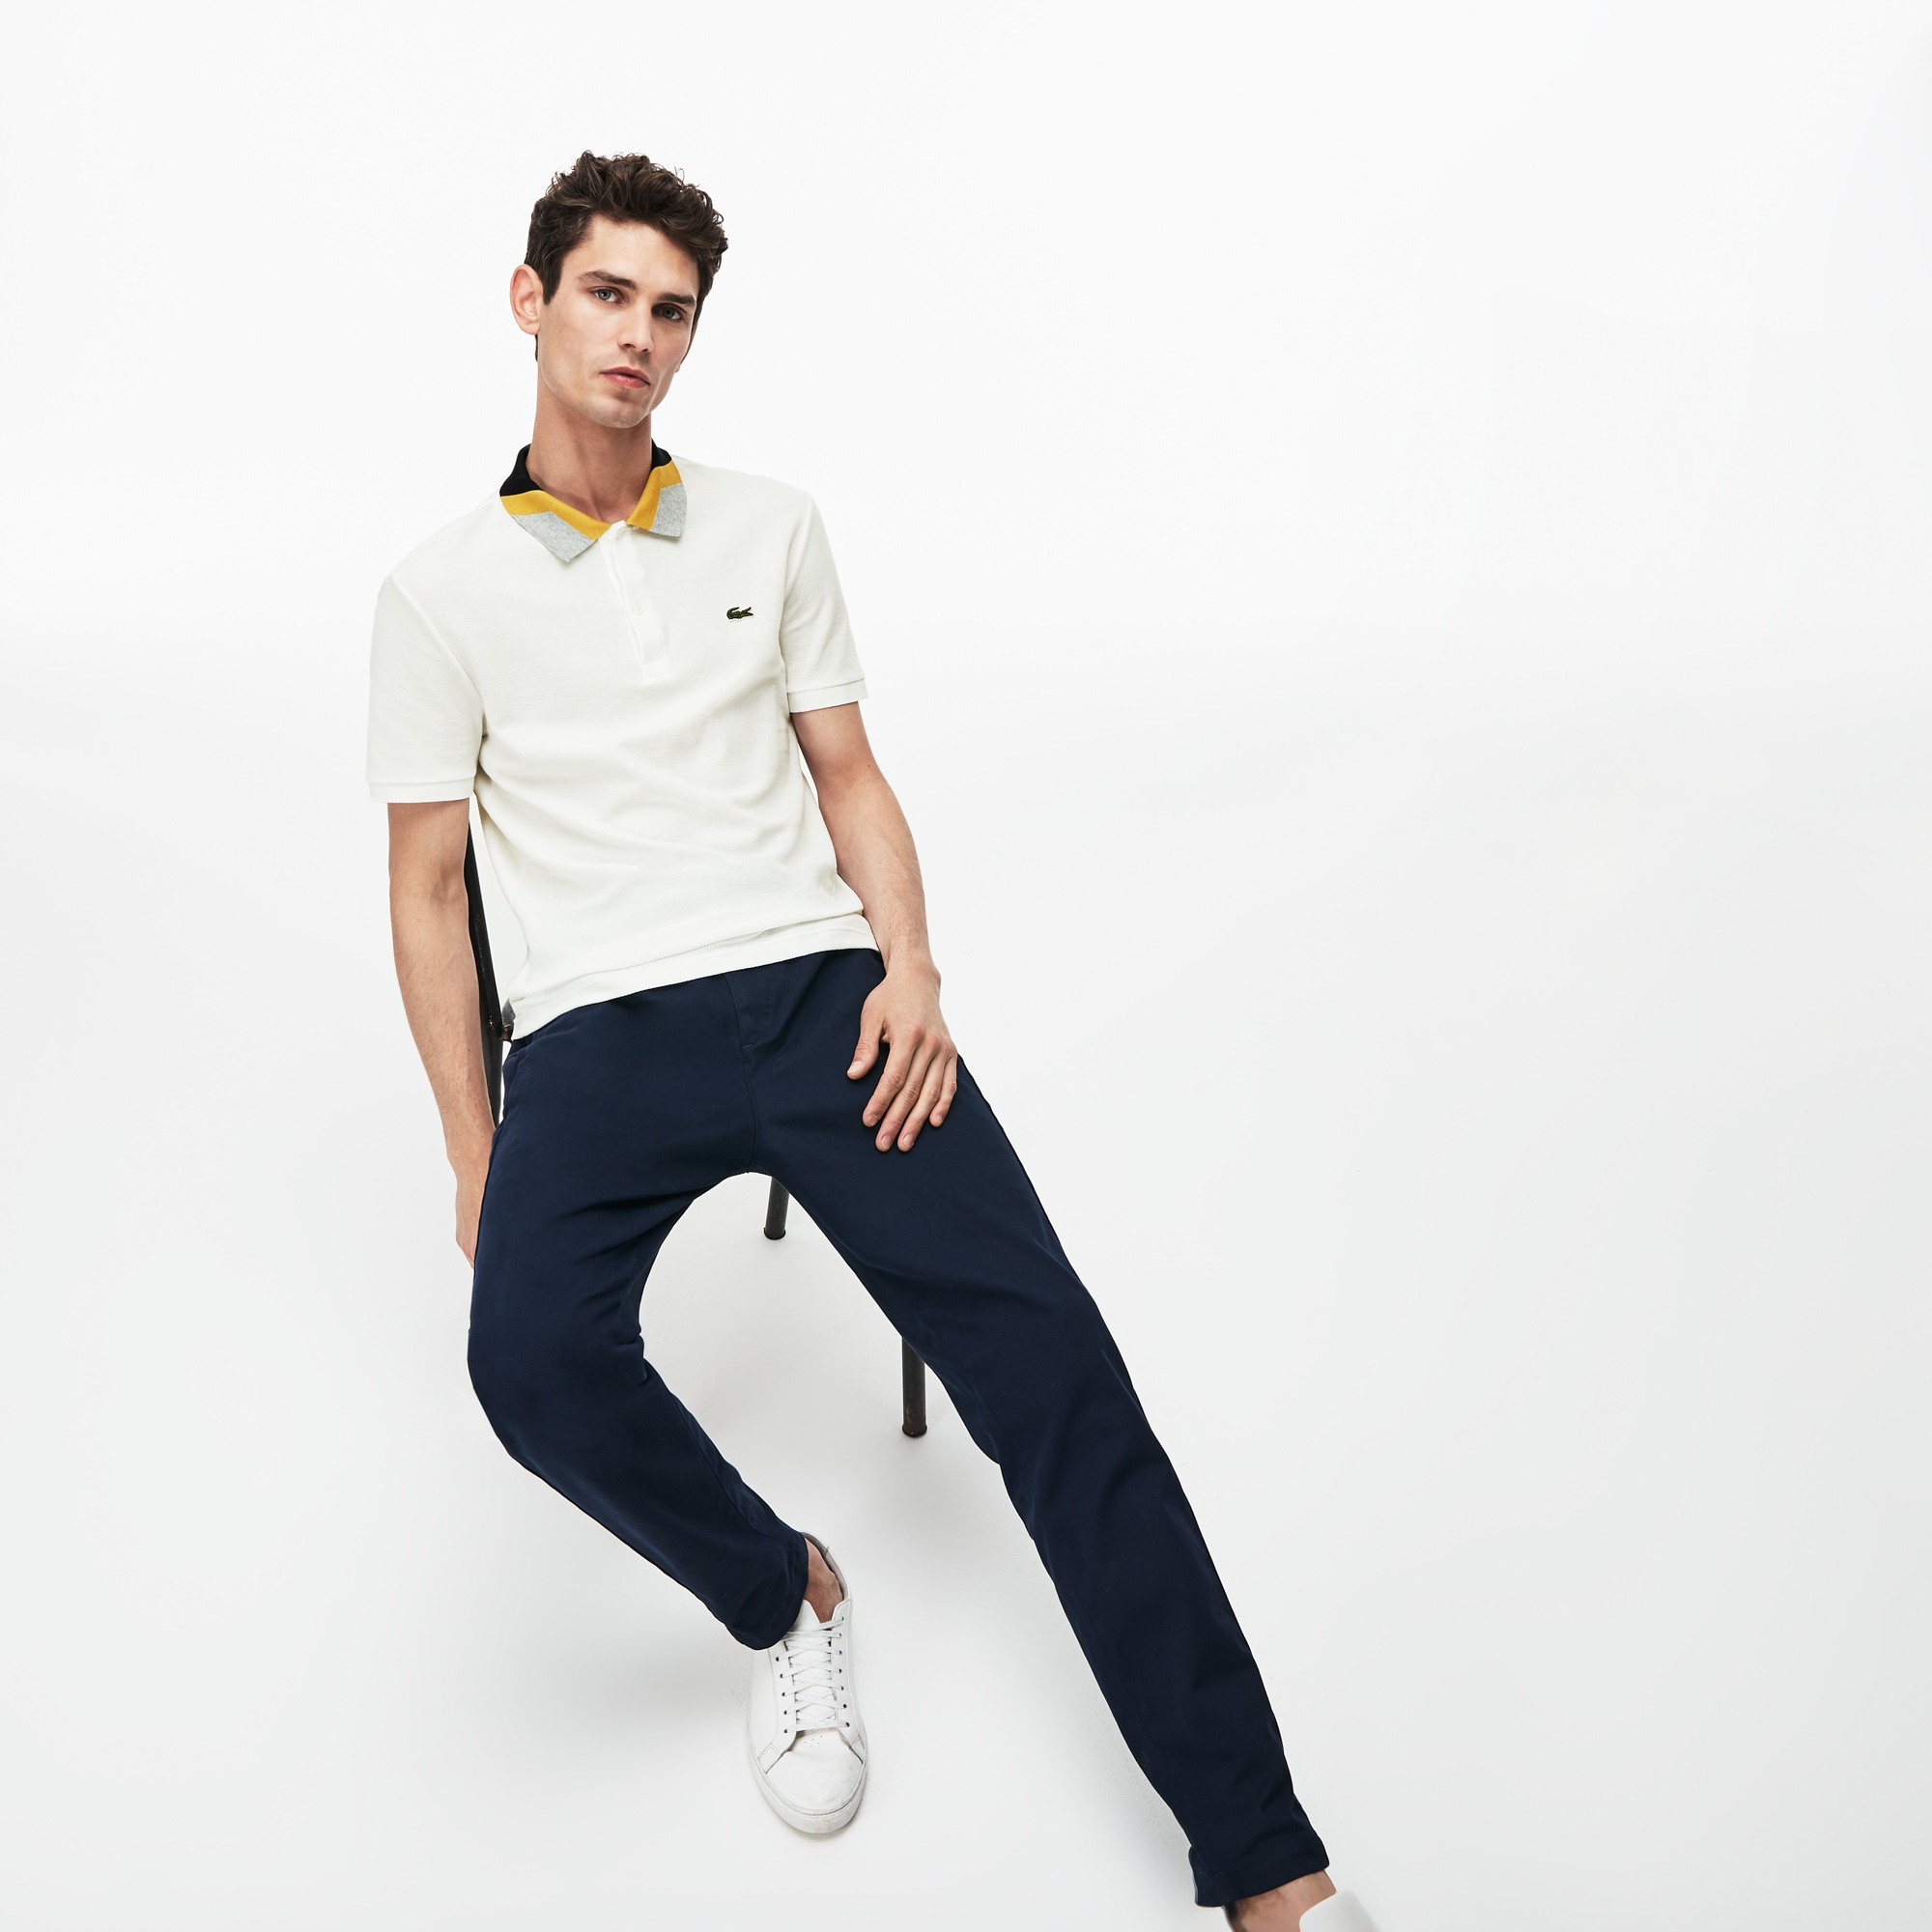 Lacoste男士修身版拼色条纹结子凸纹网眼面料Polo衫